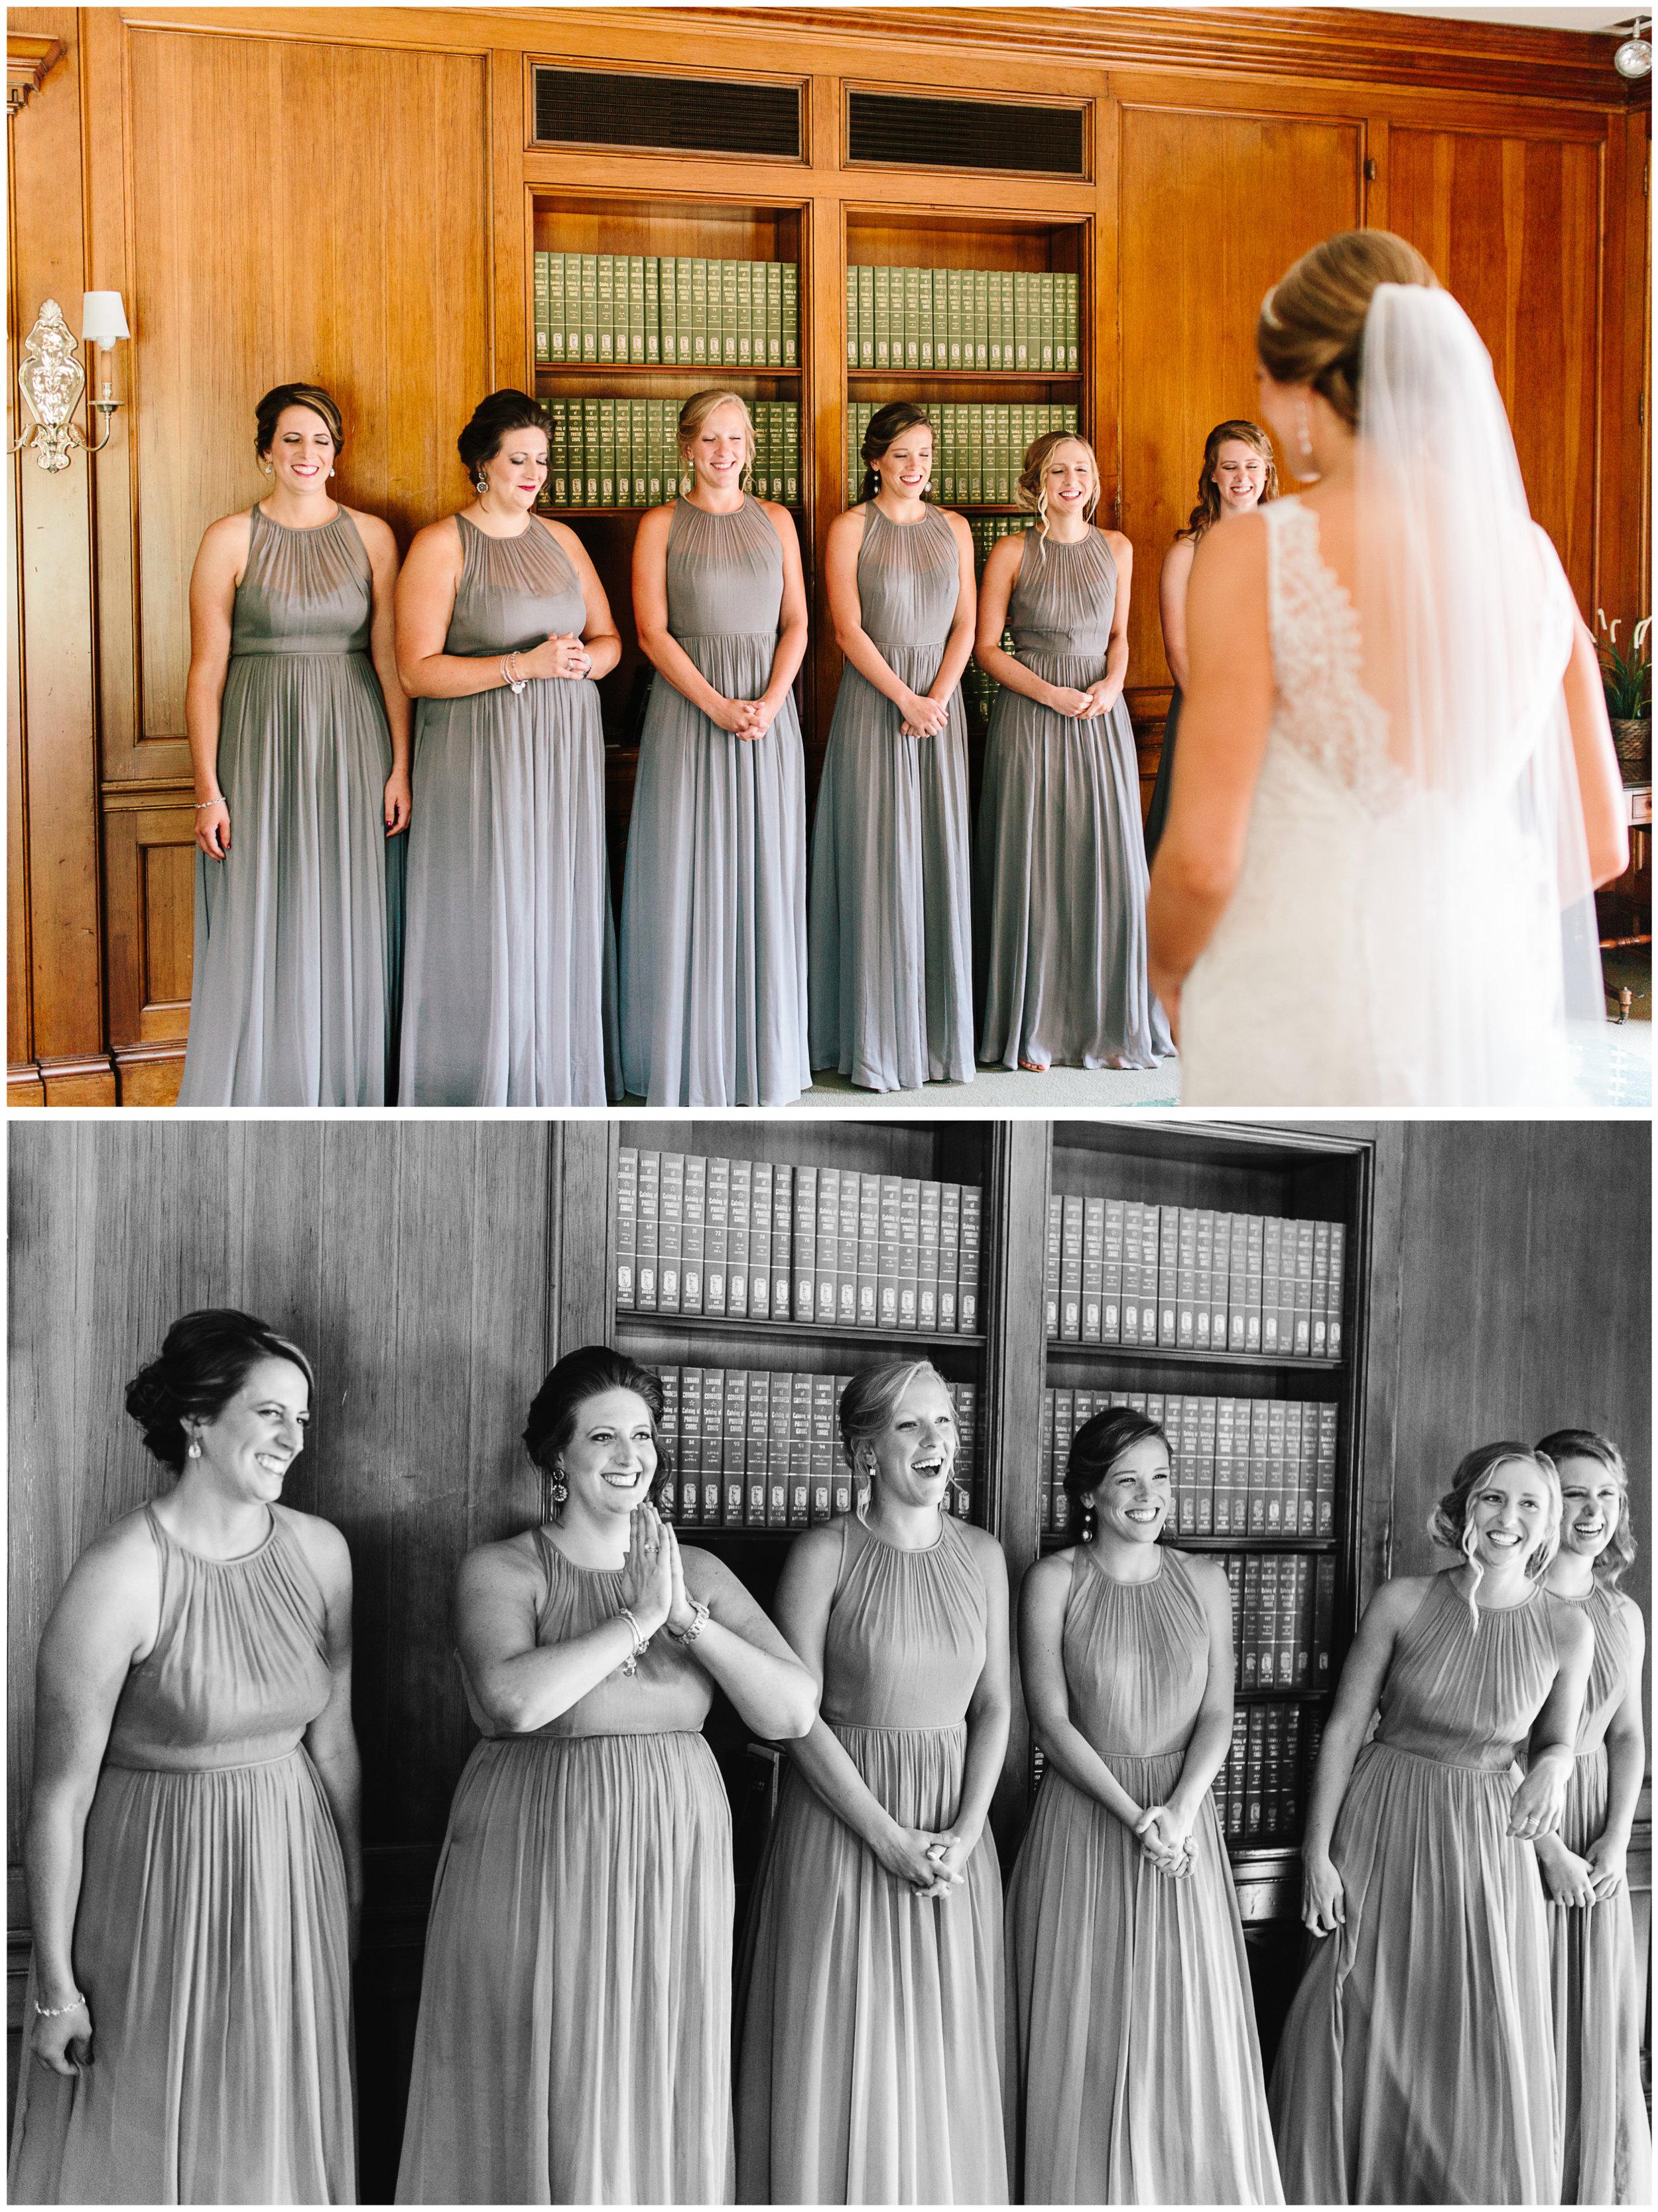 ann_arbor_michigan_wedding_16.jpg